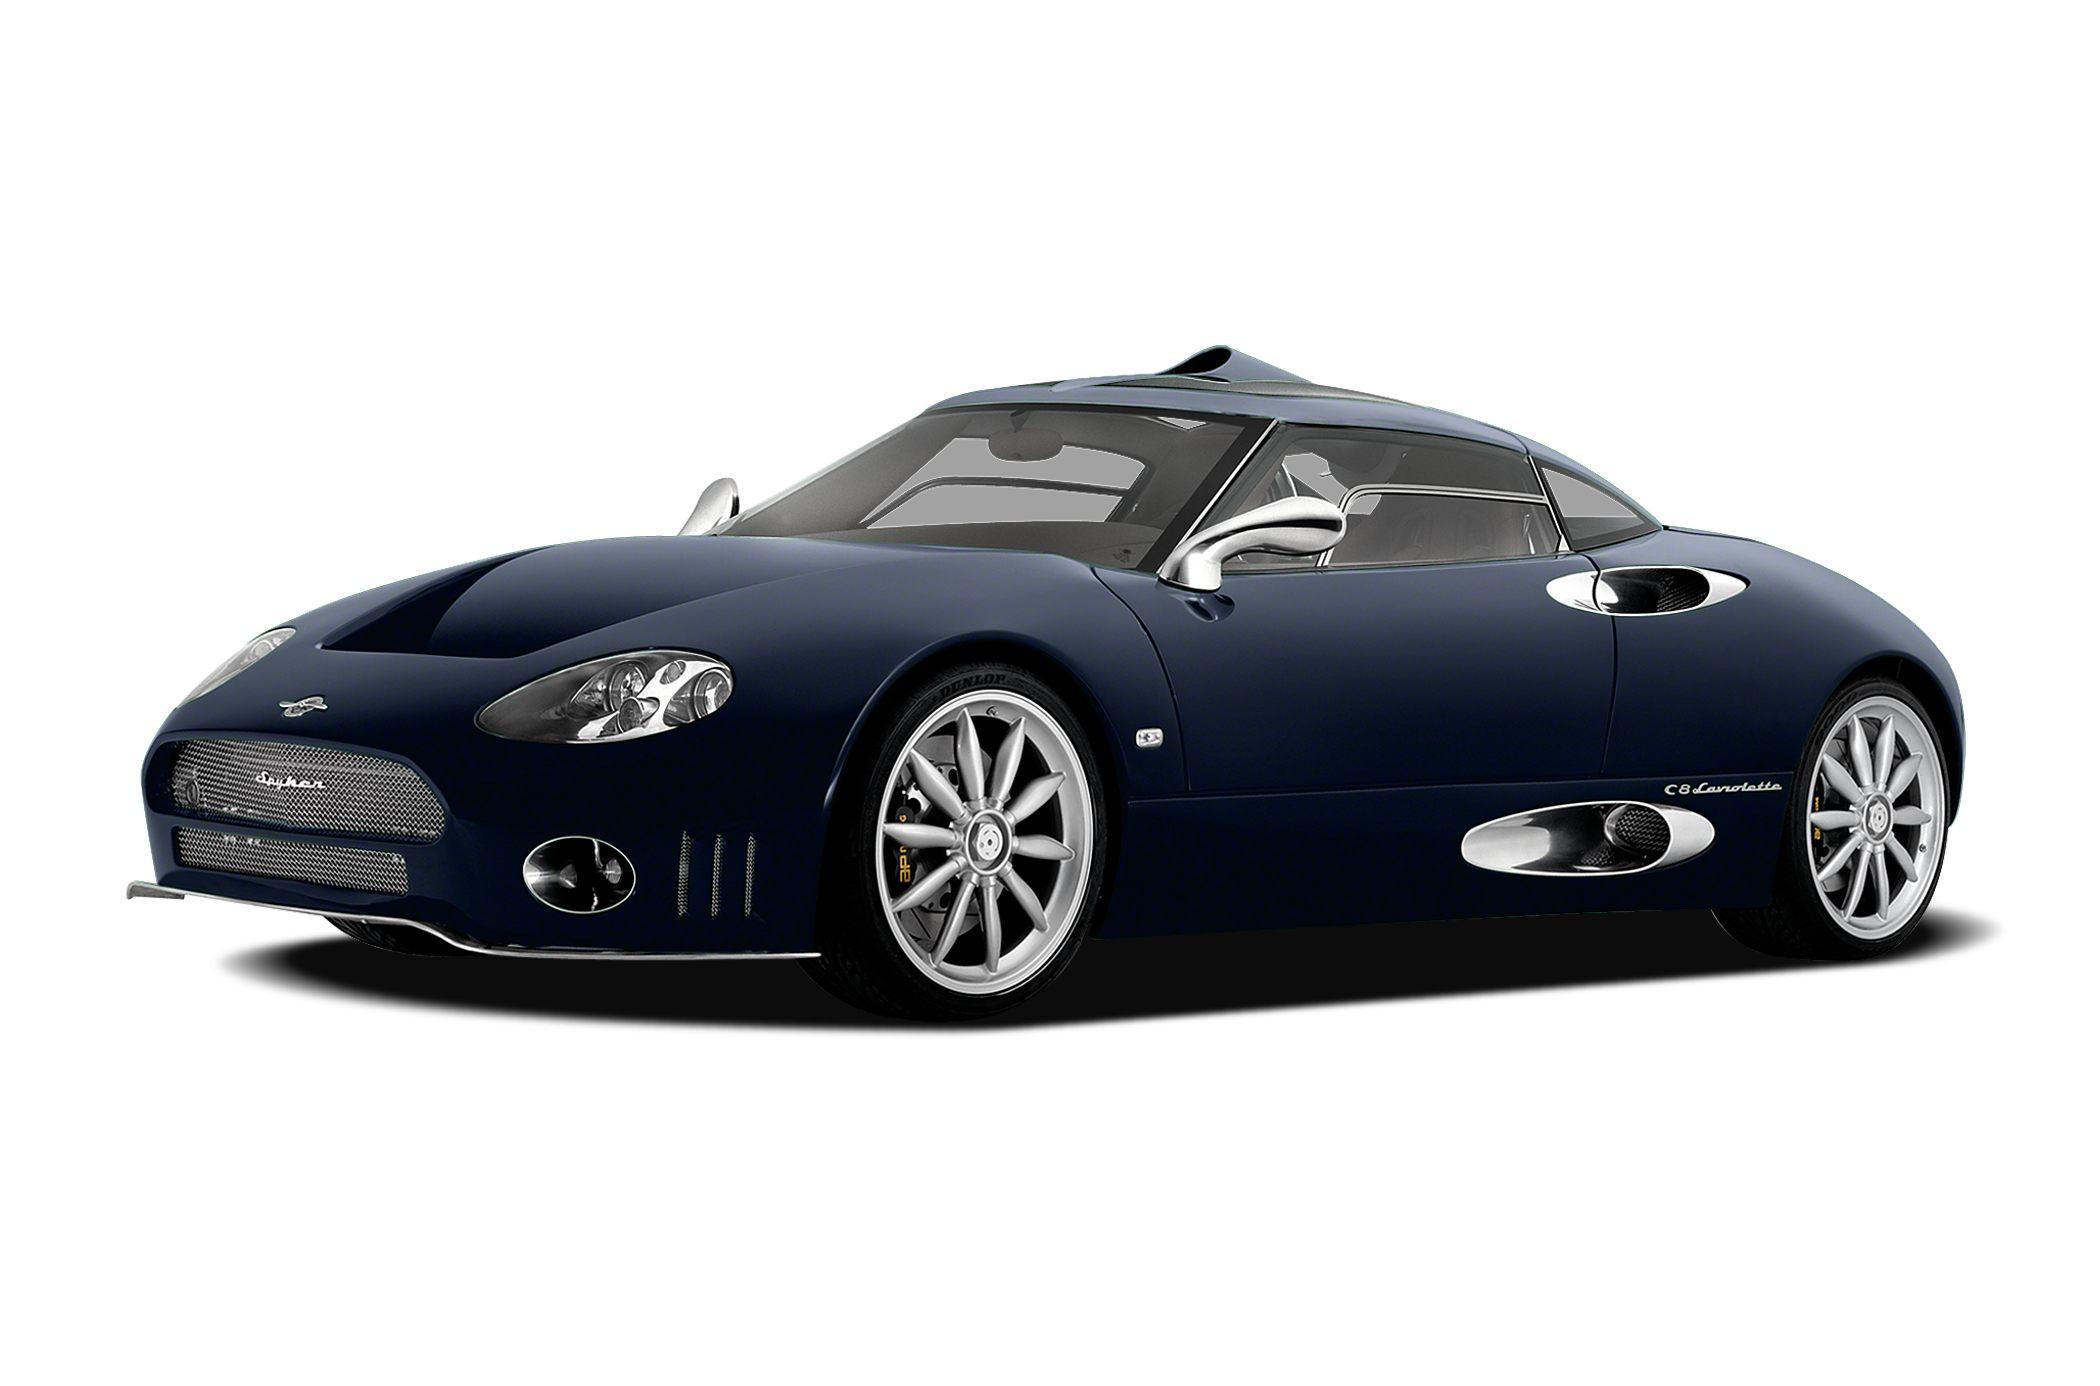 2009 Spyker C8 Laviolette